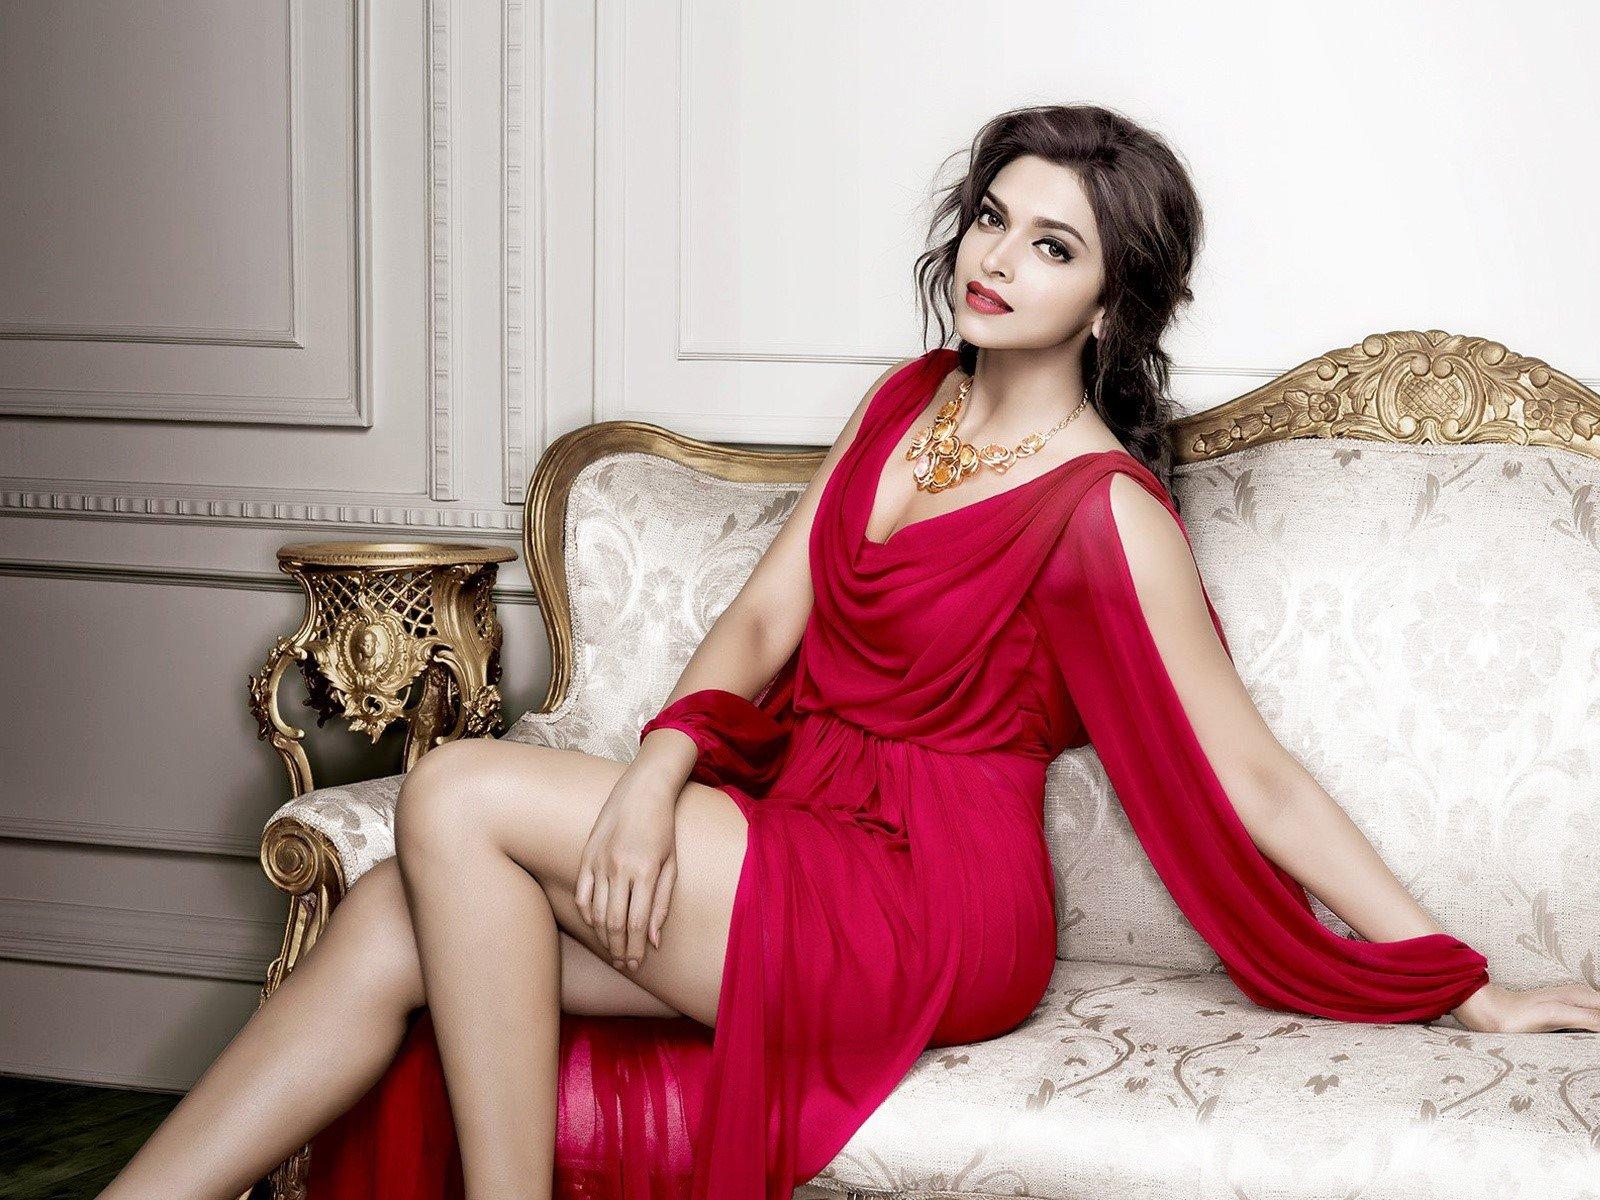 Fondo de pantalla de Deepika Padukone en un sillón Imágenes